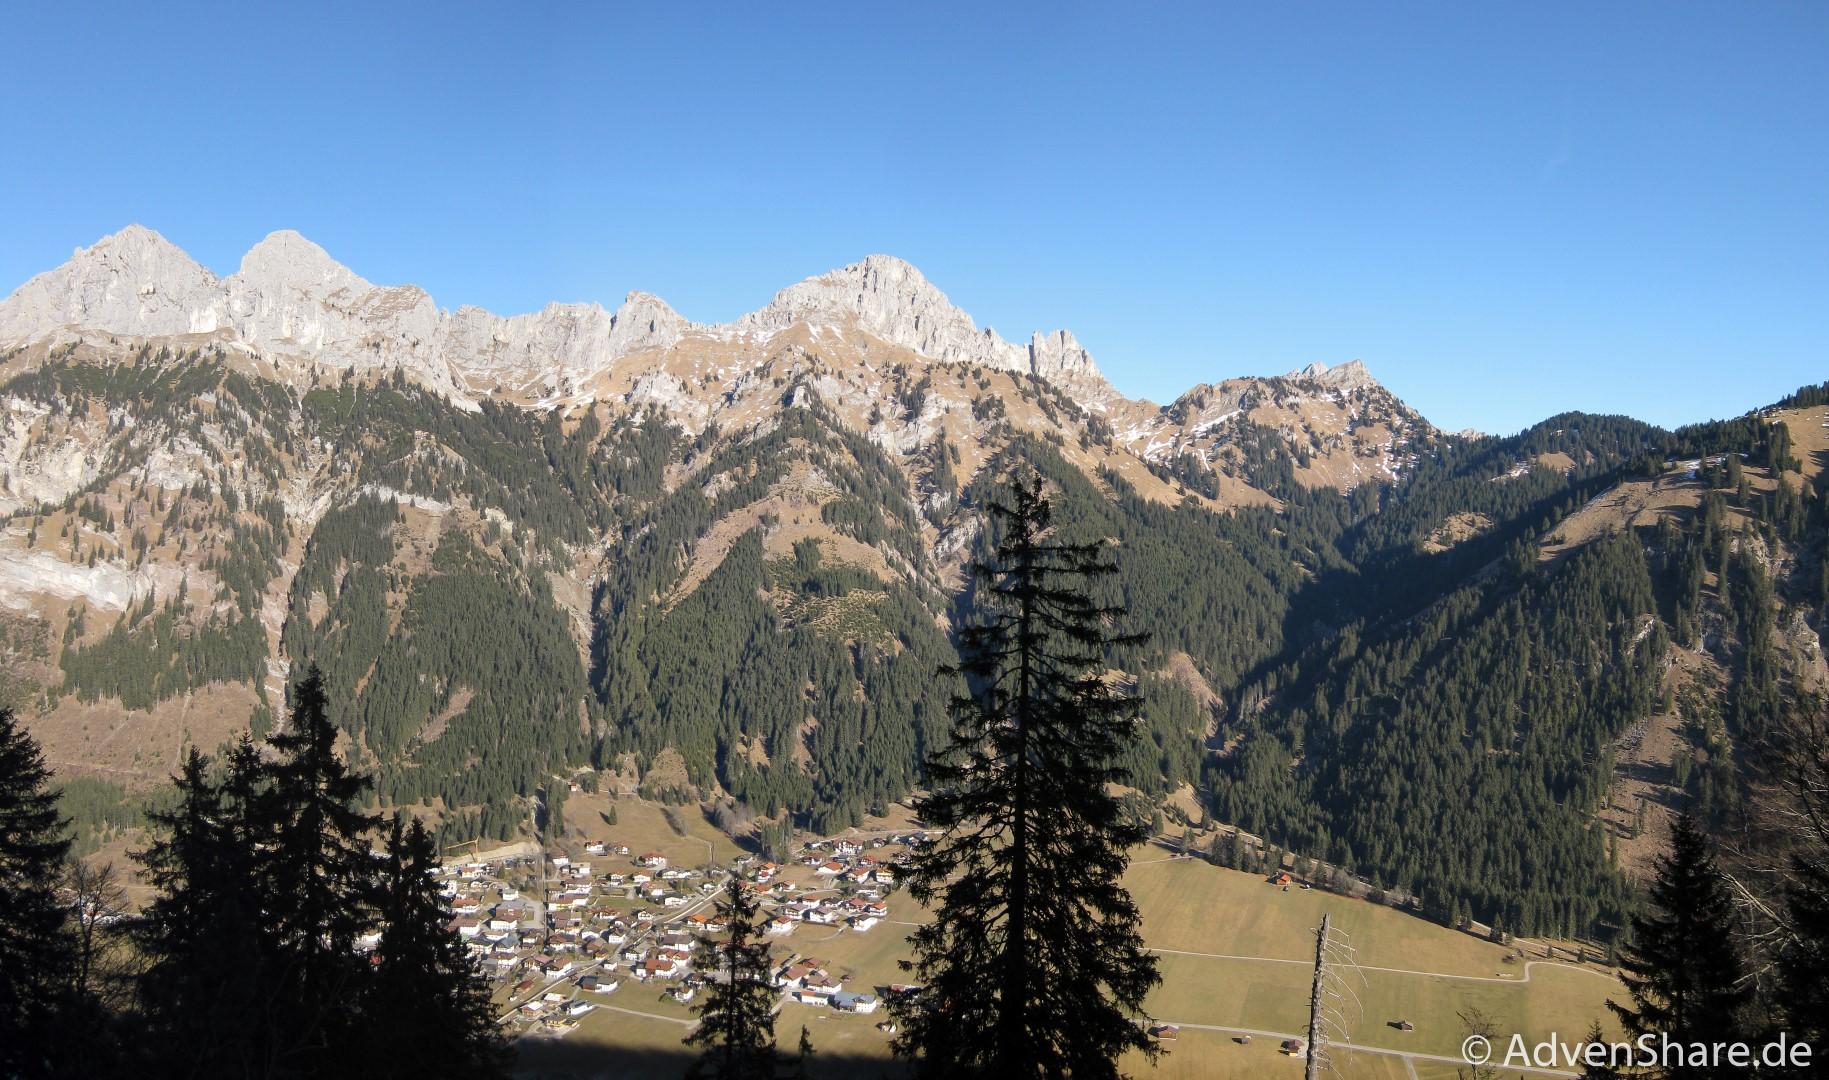 02_Krinnenspitze (Large)